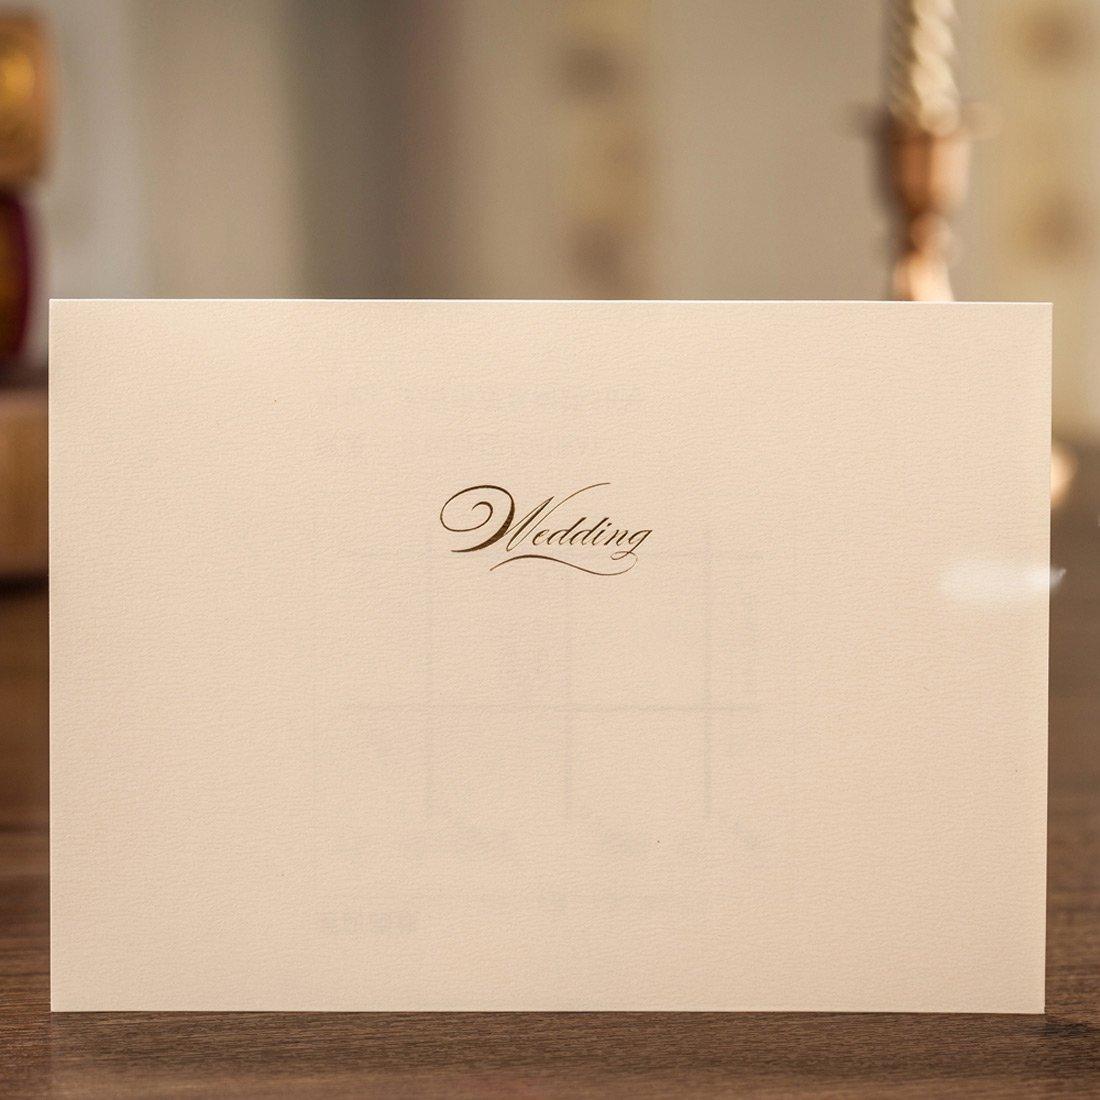 Wishmade Wedding Invitations Cards Kits 50 Sets White Horizontal ...